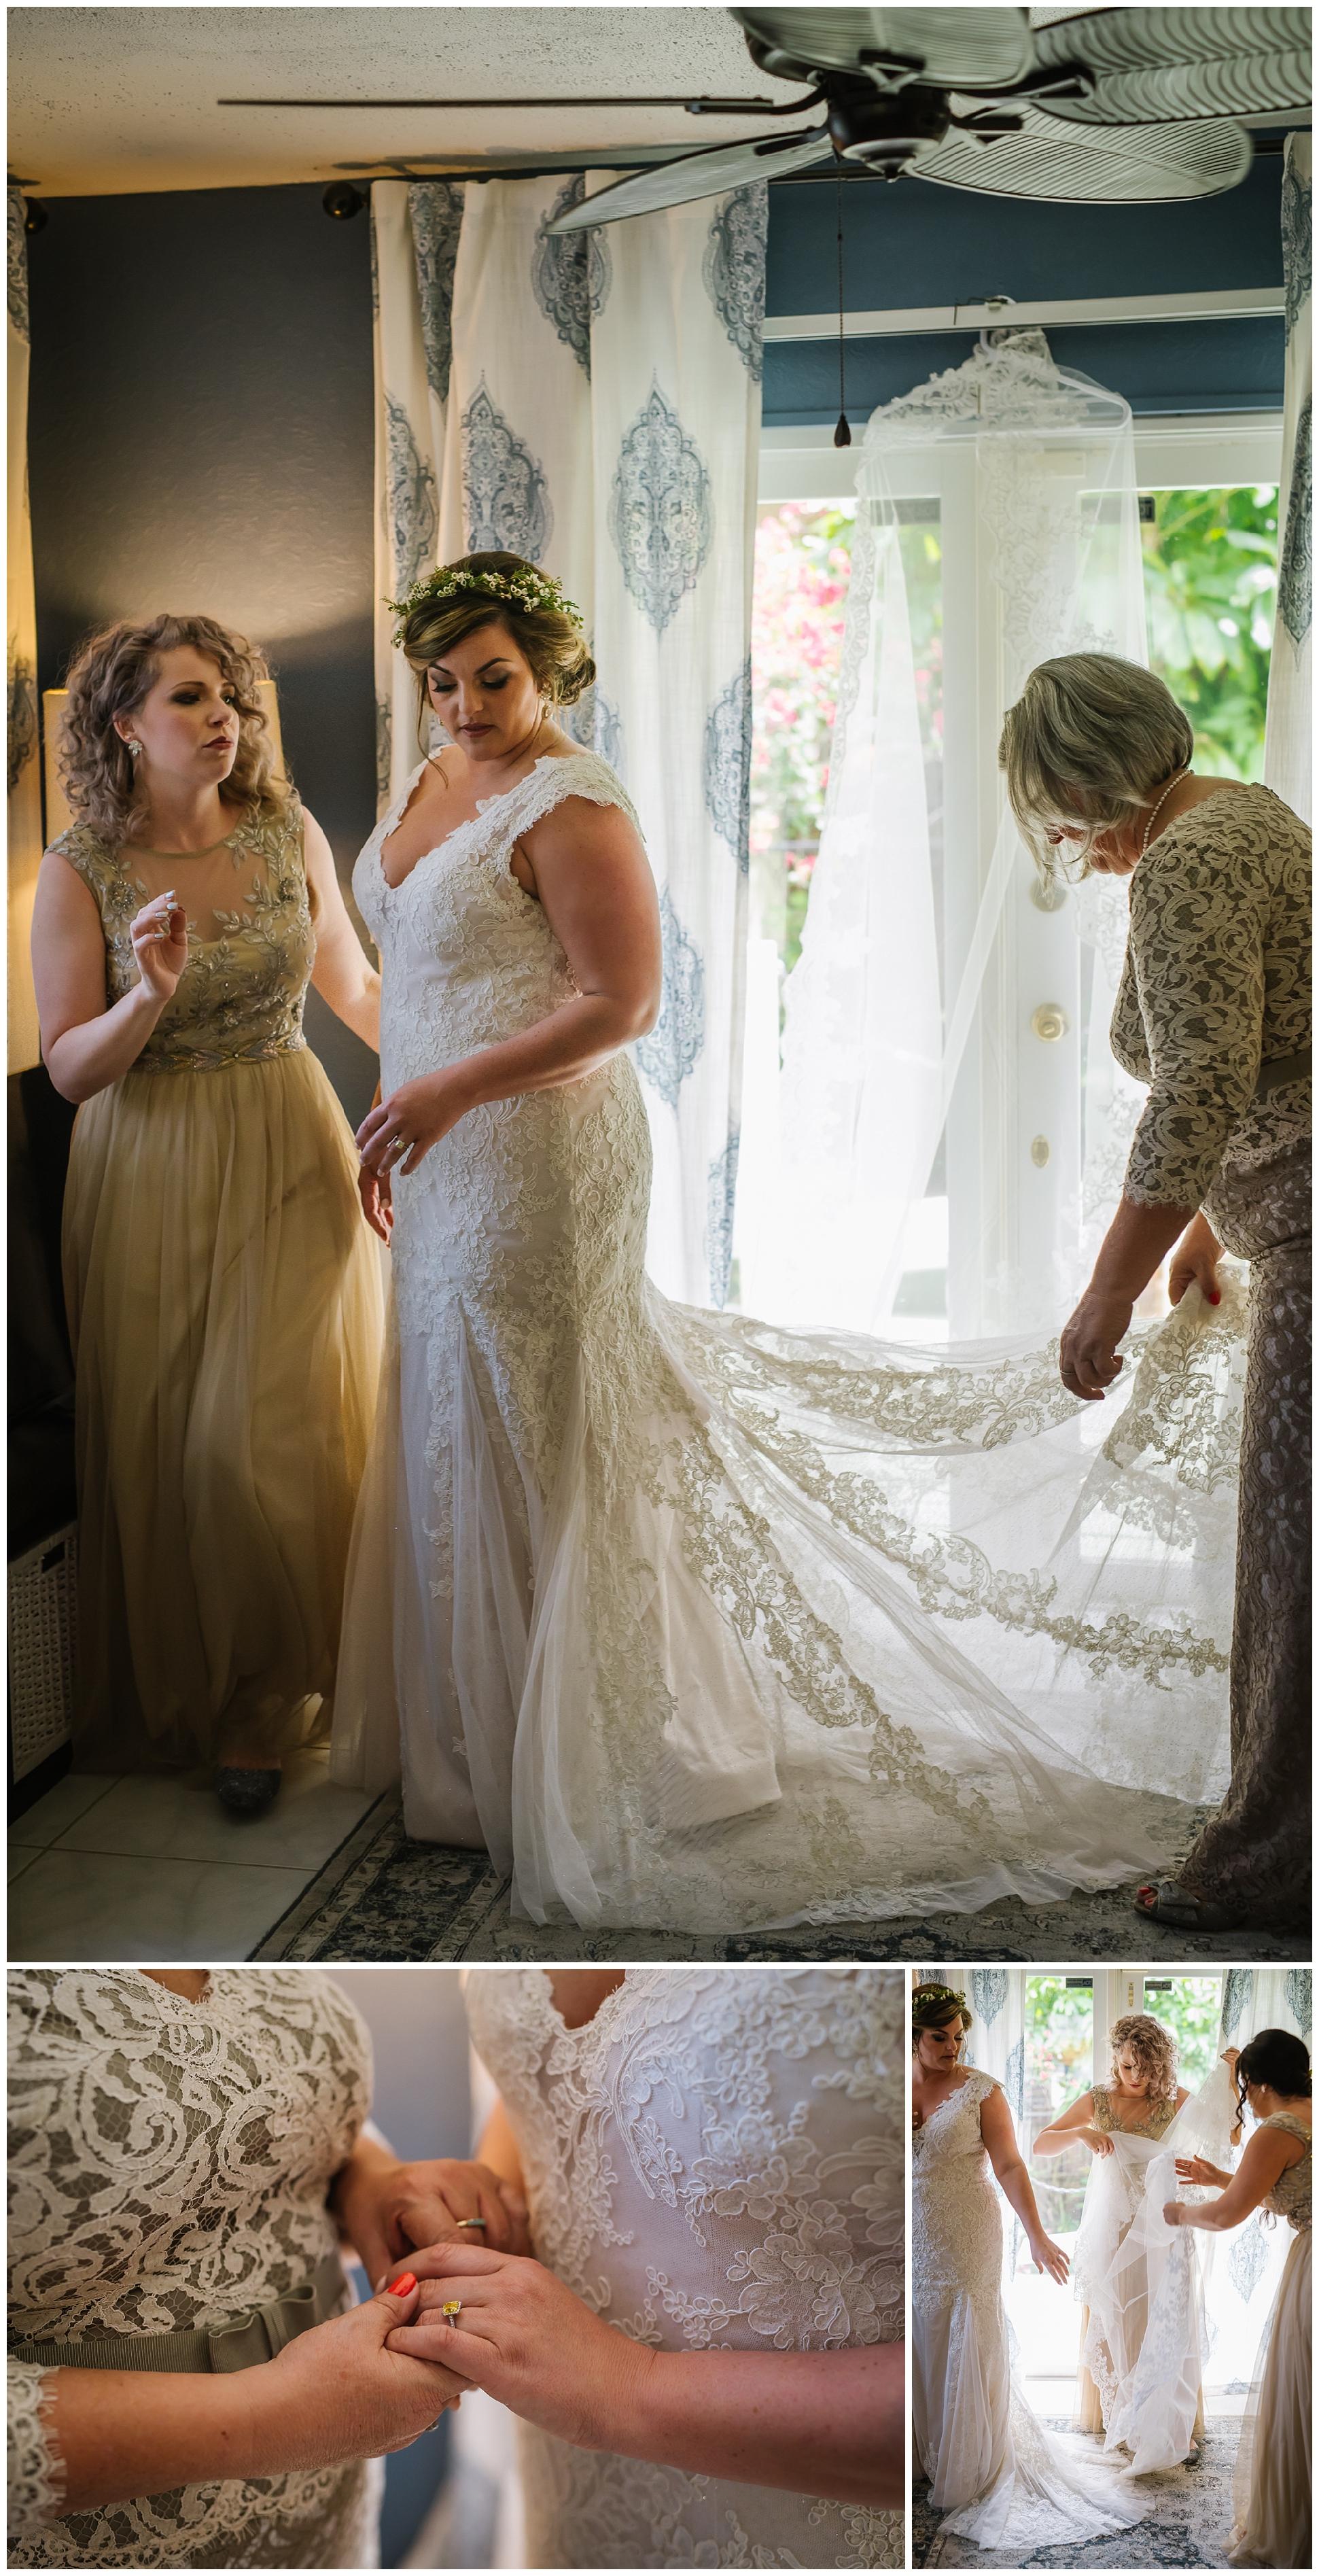 st-pete-wedding-photographer-italian-romance-theme-rustic-flower-crown_0381.jpg